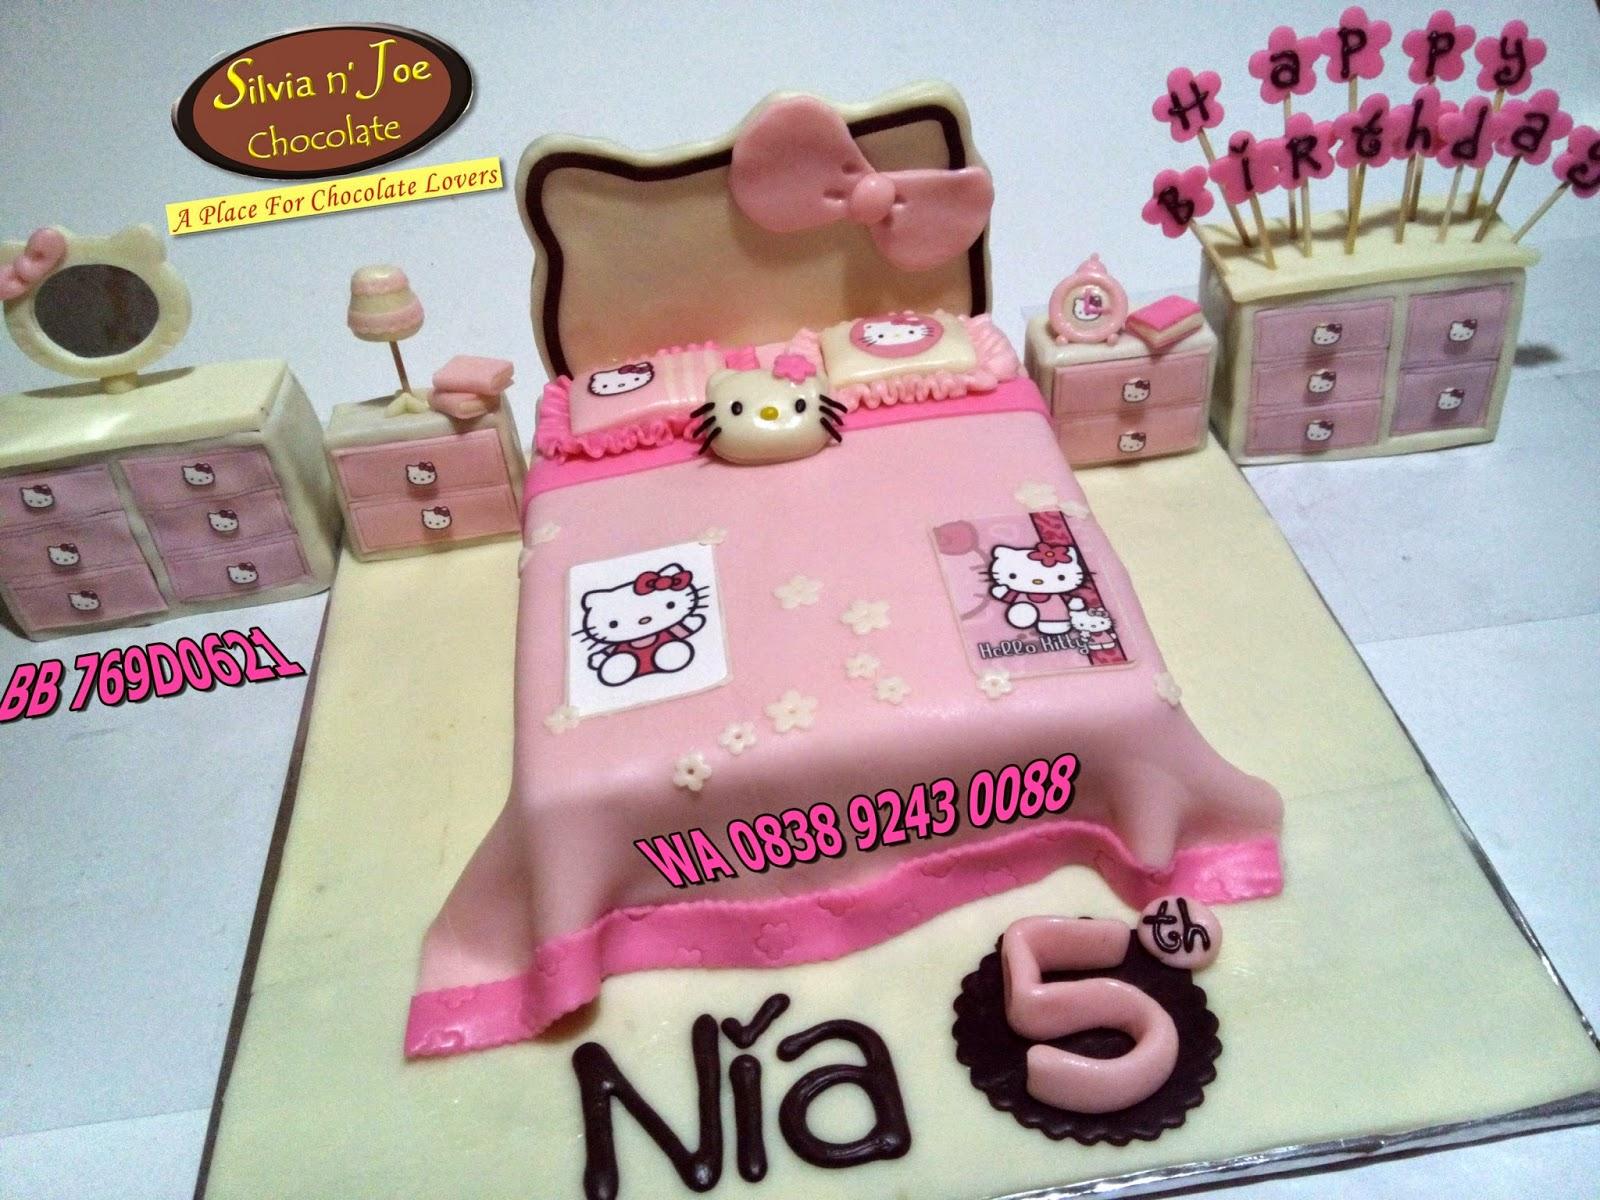 CAKE MALANG, TART POOR, POOR CHOCOLATE, CAKE HELLO KITTY, HELLO KITTY CAKE ROOM